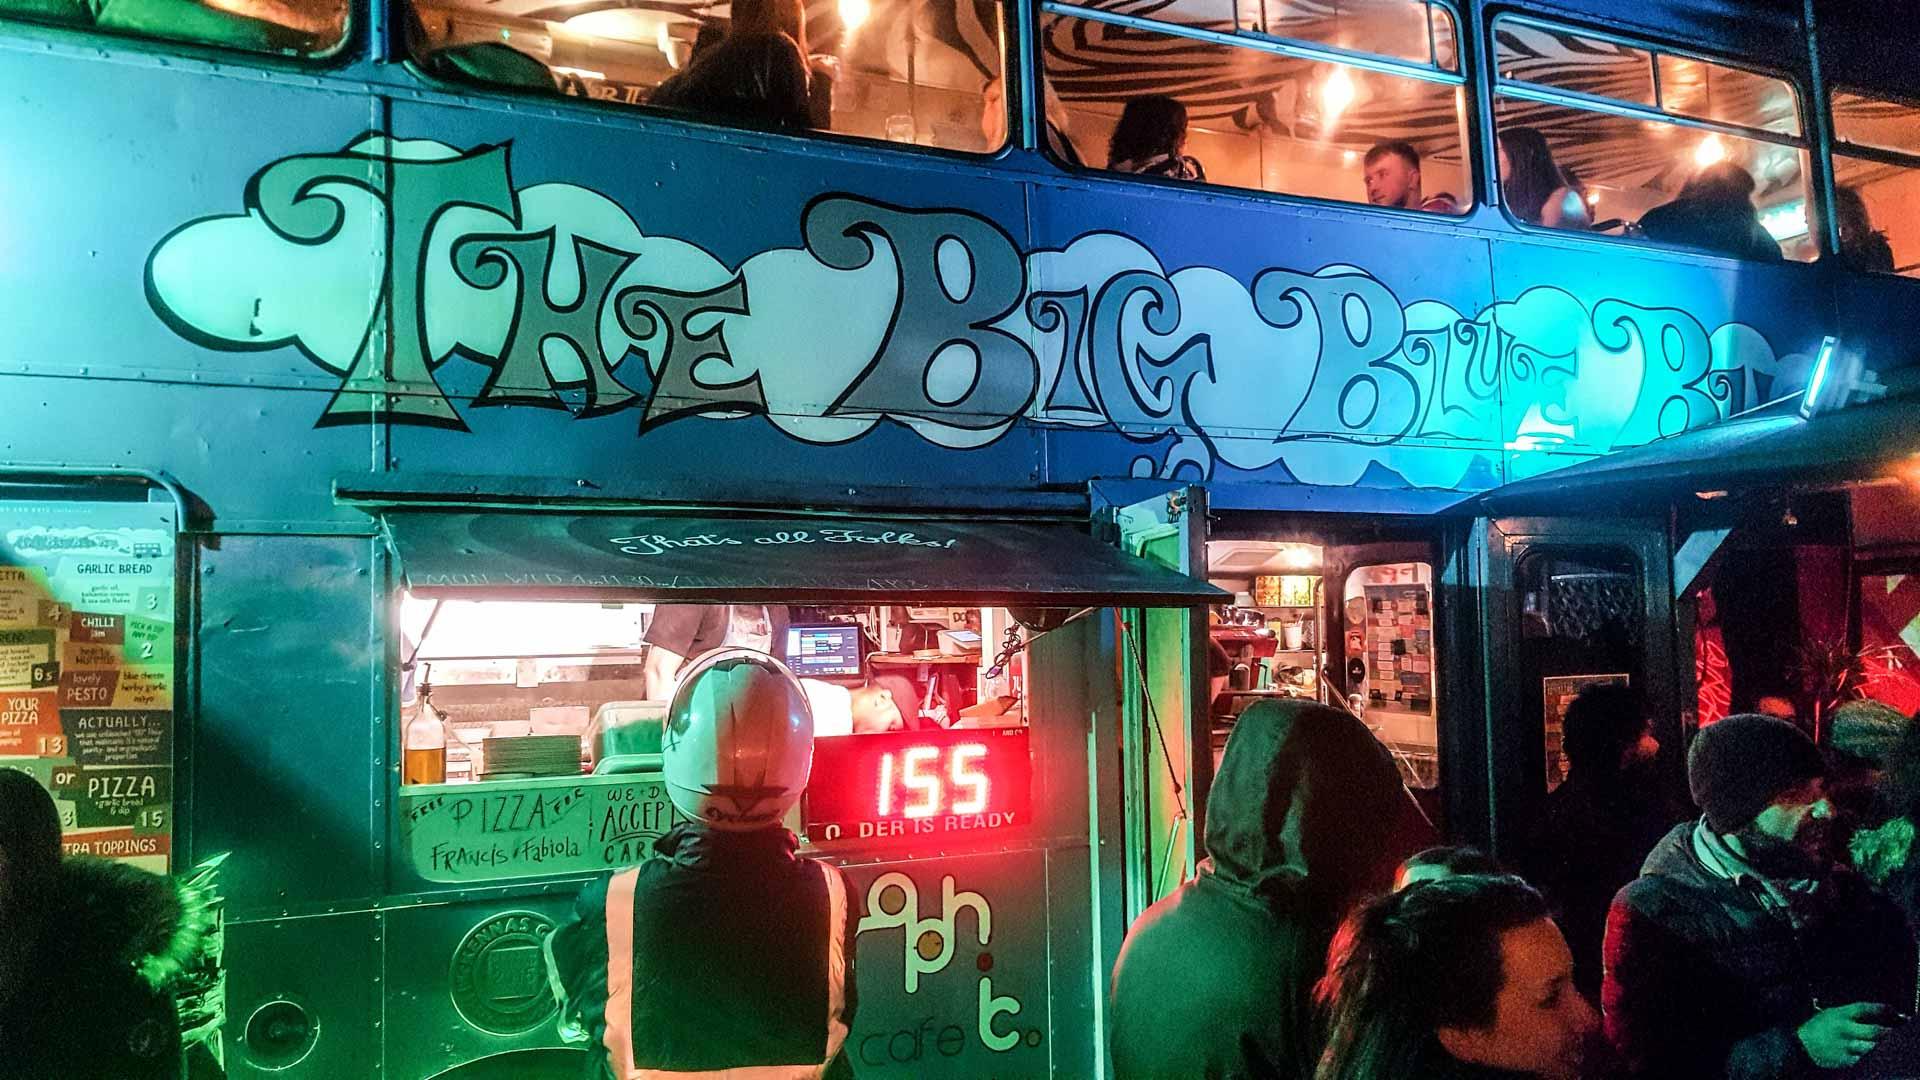 The Big Blue Bus, Dublín, Irlanda